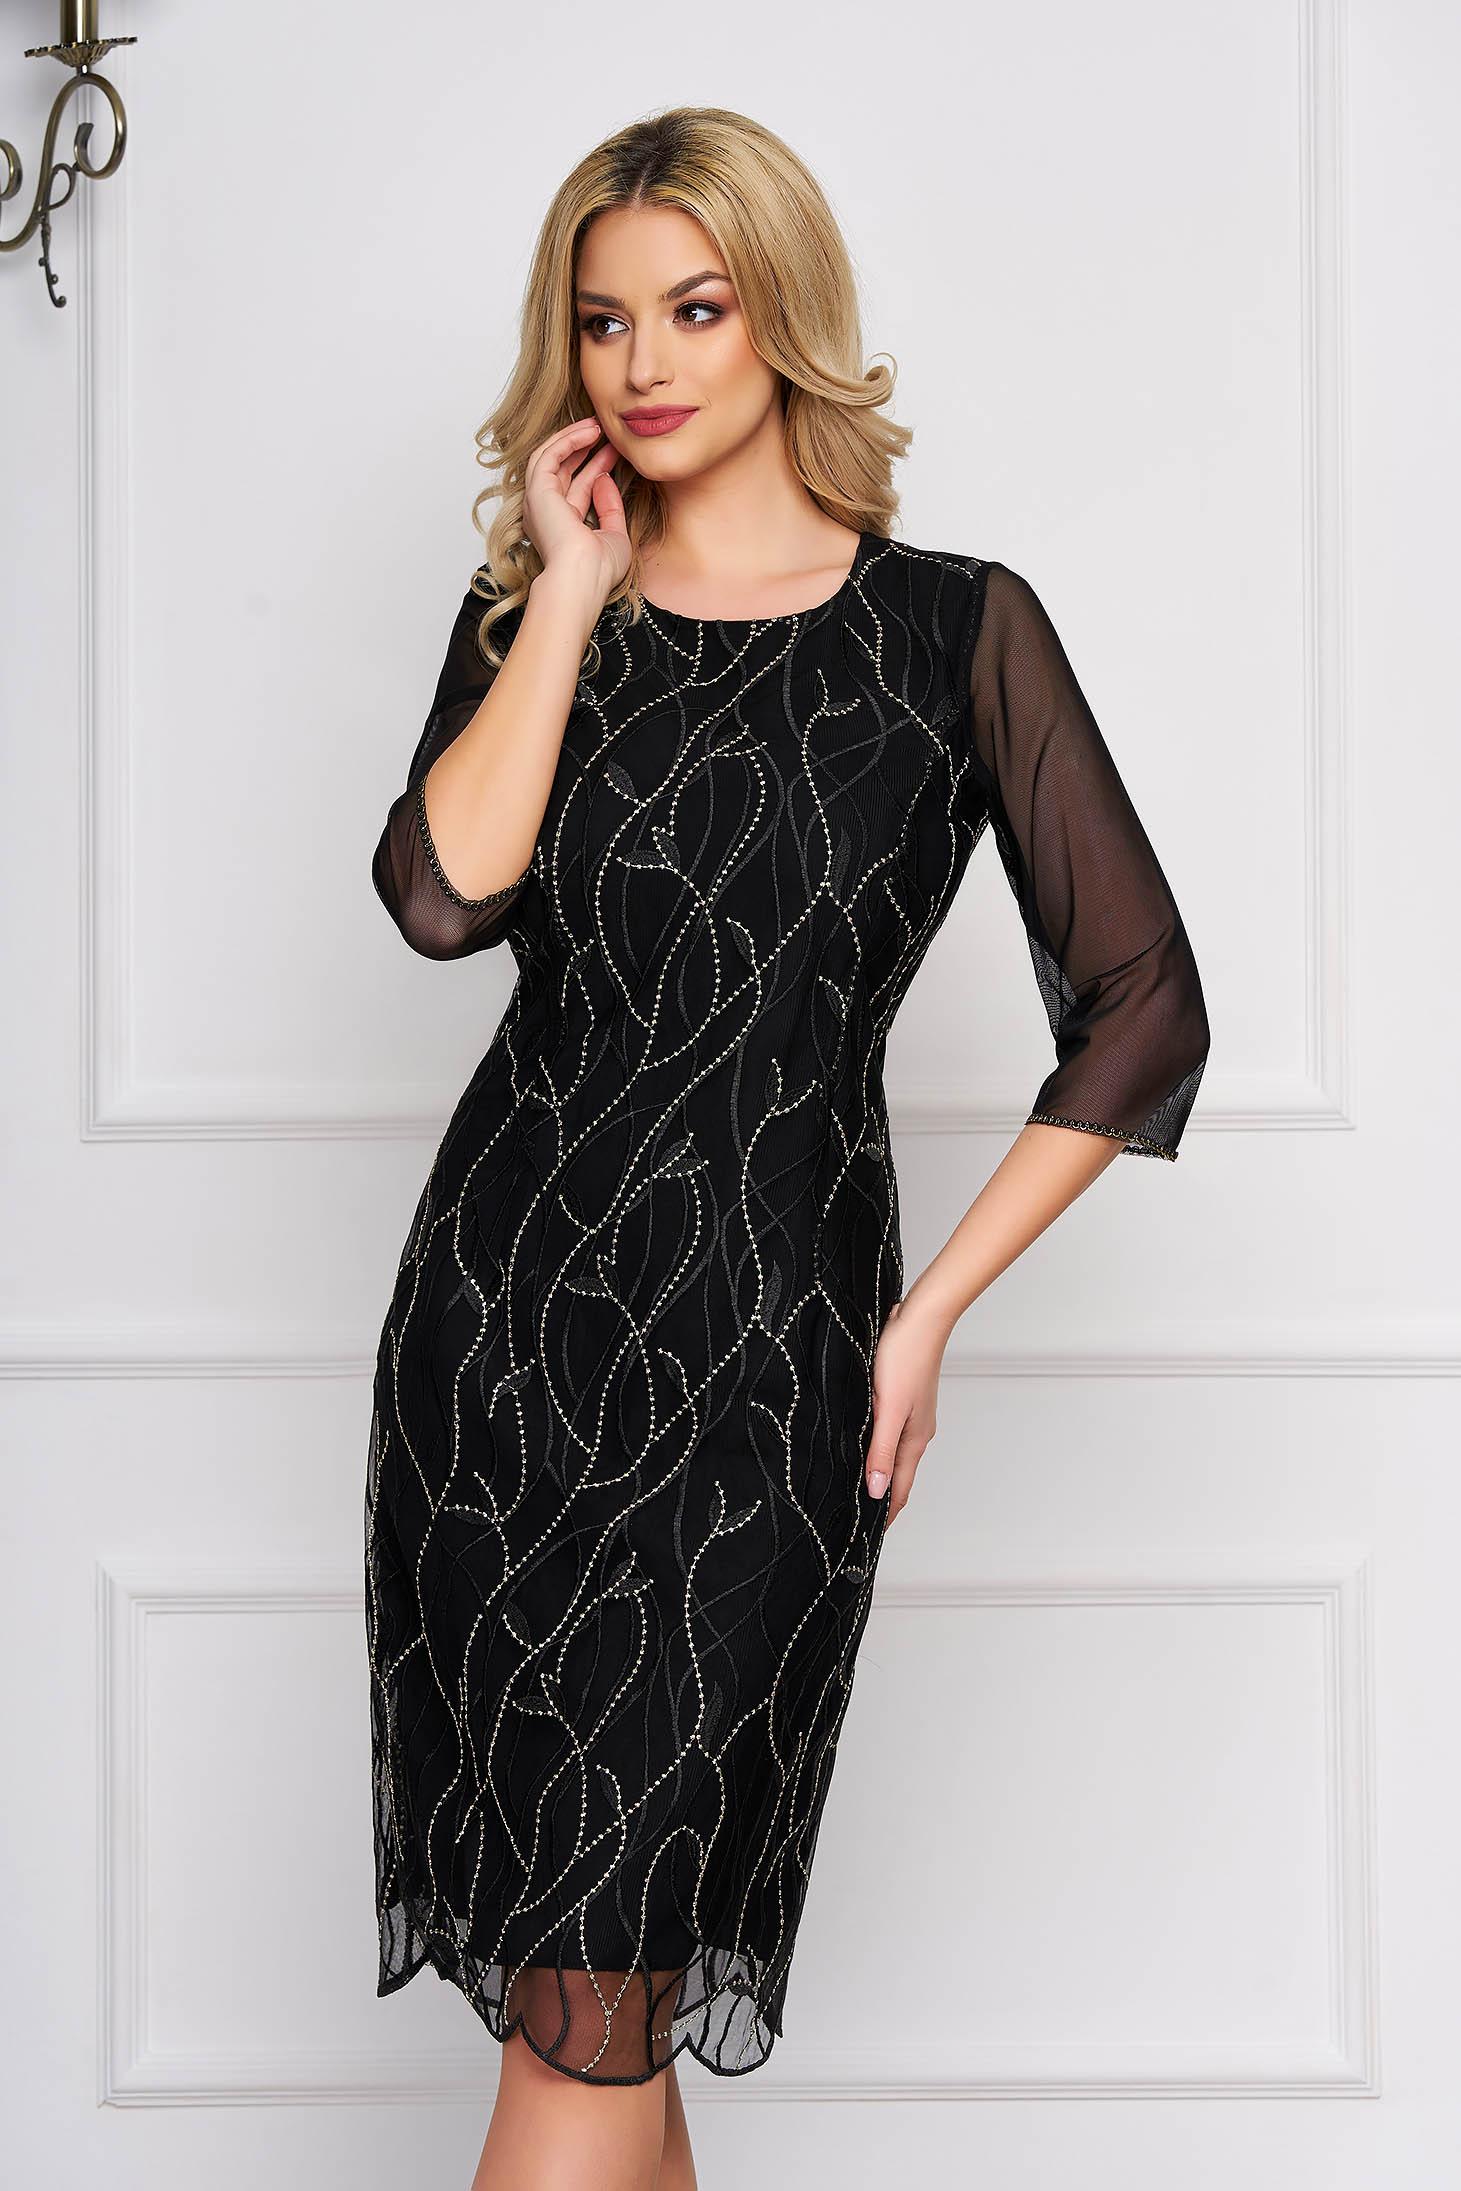 StarShinerS black dress elegant with 3/4 sleeves cloth pencil midi